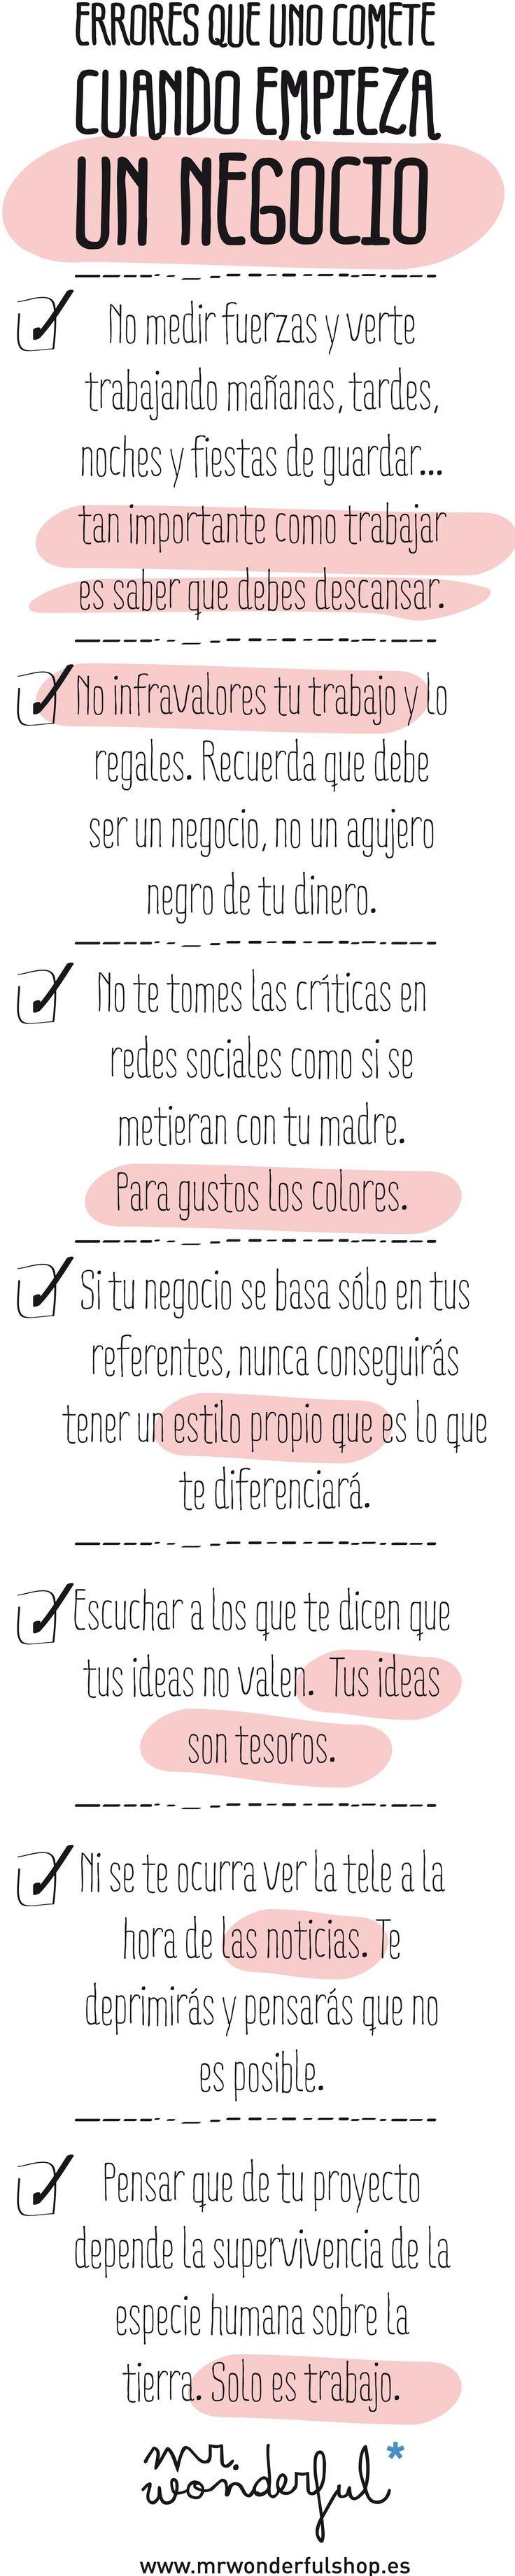 En #Socialmedia @Gfuece (Lupita Fuentes) #Marketing #Emprendedores #Tijuana #infografia